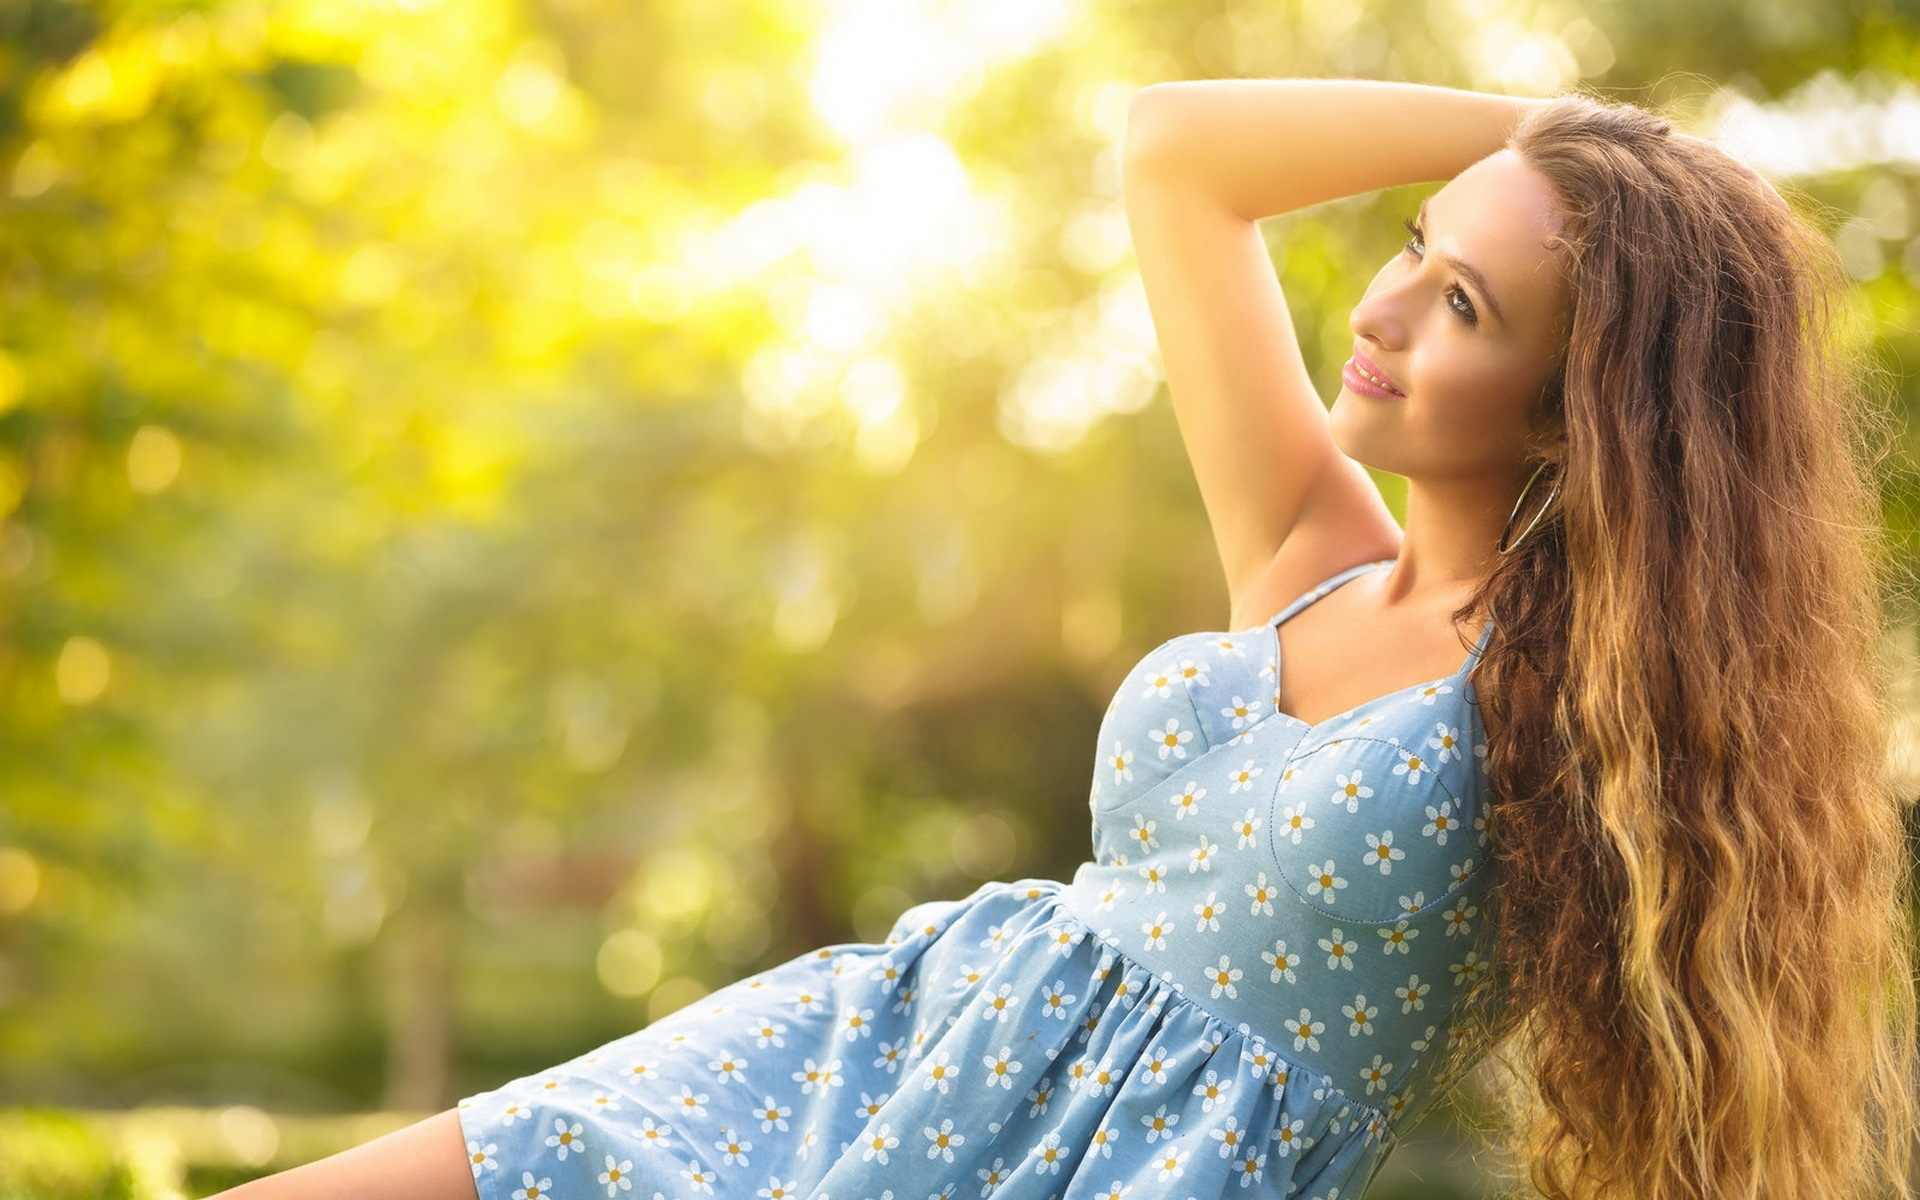 wallpaper happy girl in the summer, blue dress, sun 1920x1200 hd